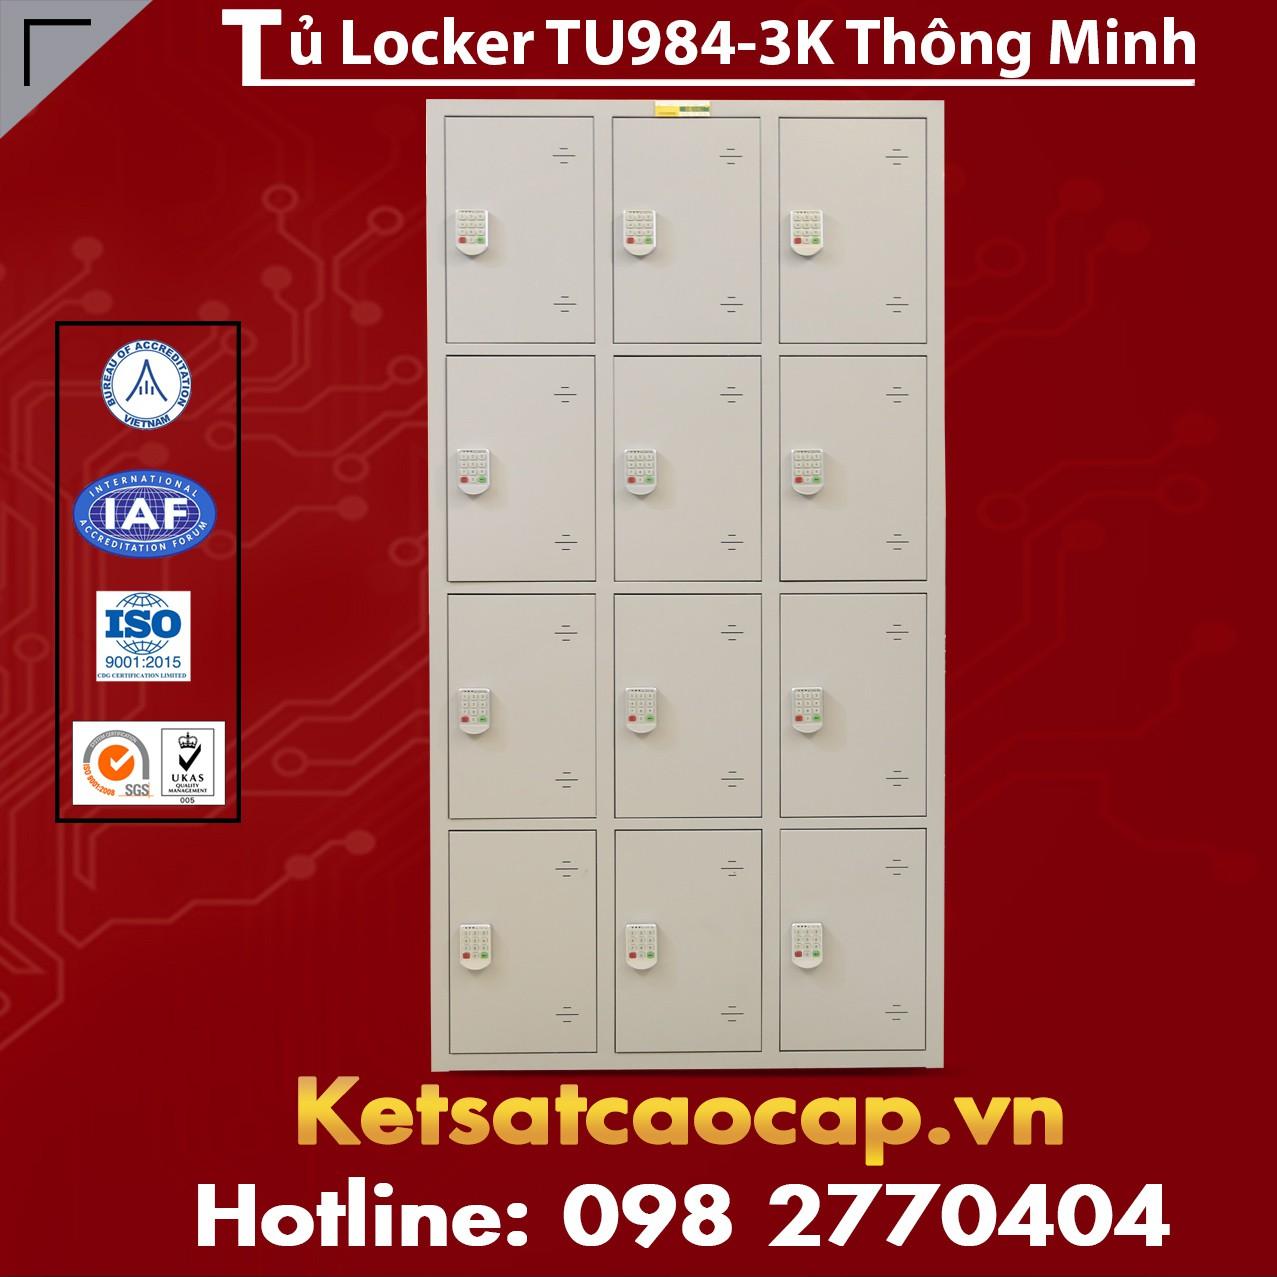 Tủ Locker TU984-3K Thông Minh